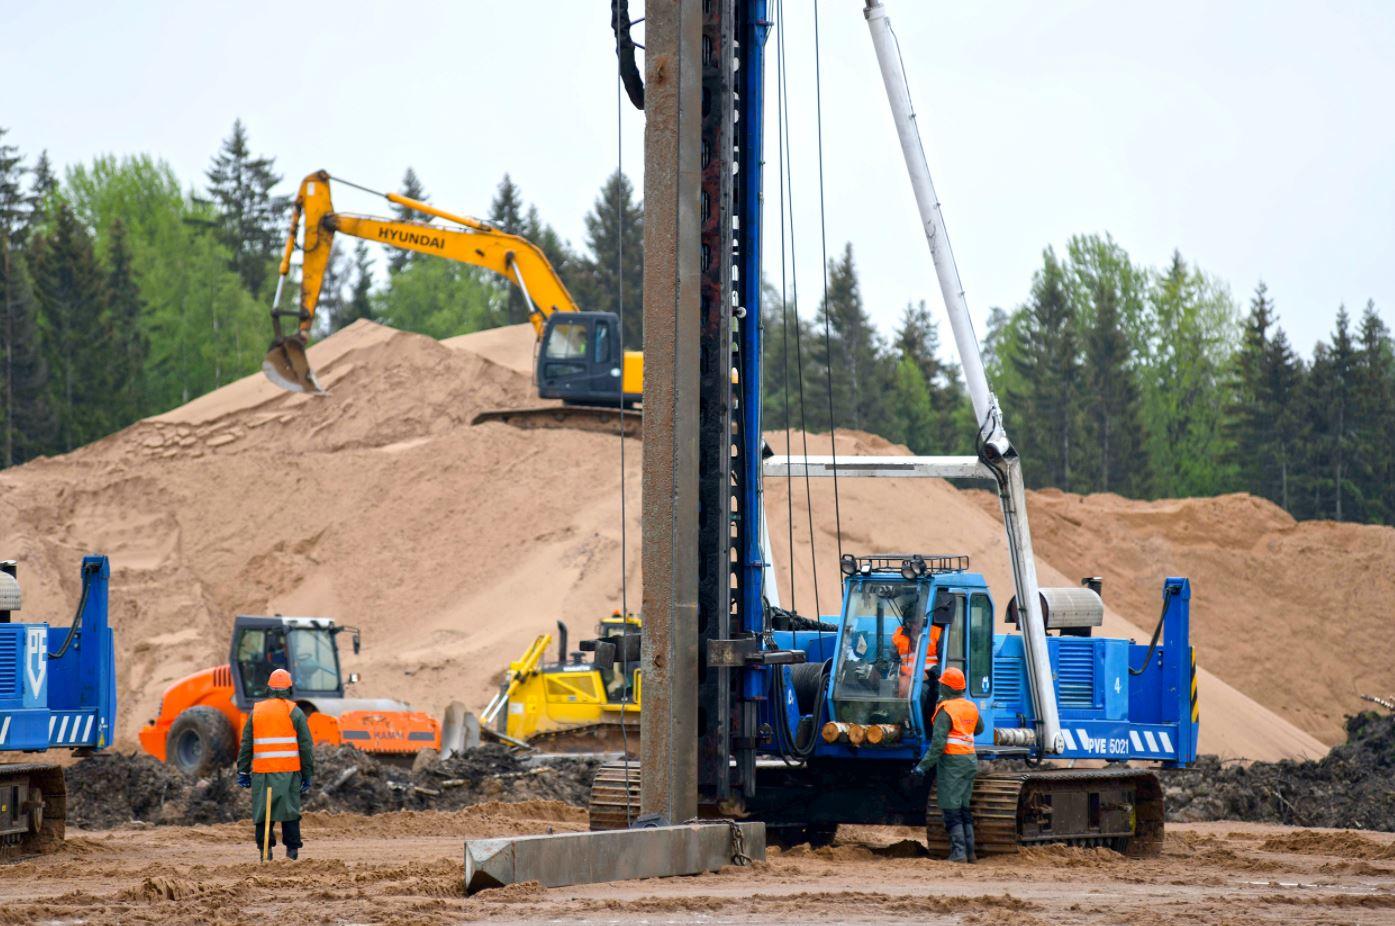 Gazprom plans third LNG train at Ust-Luga complex